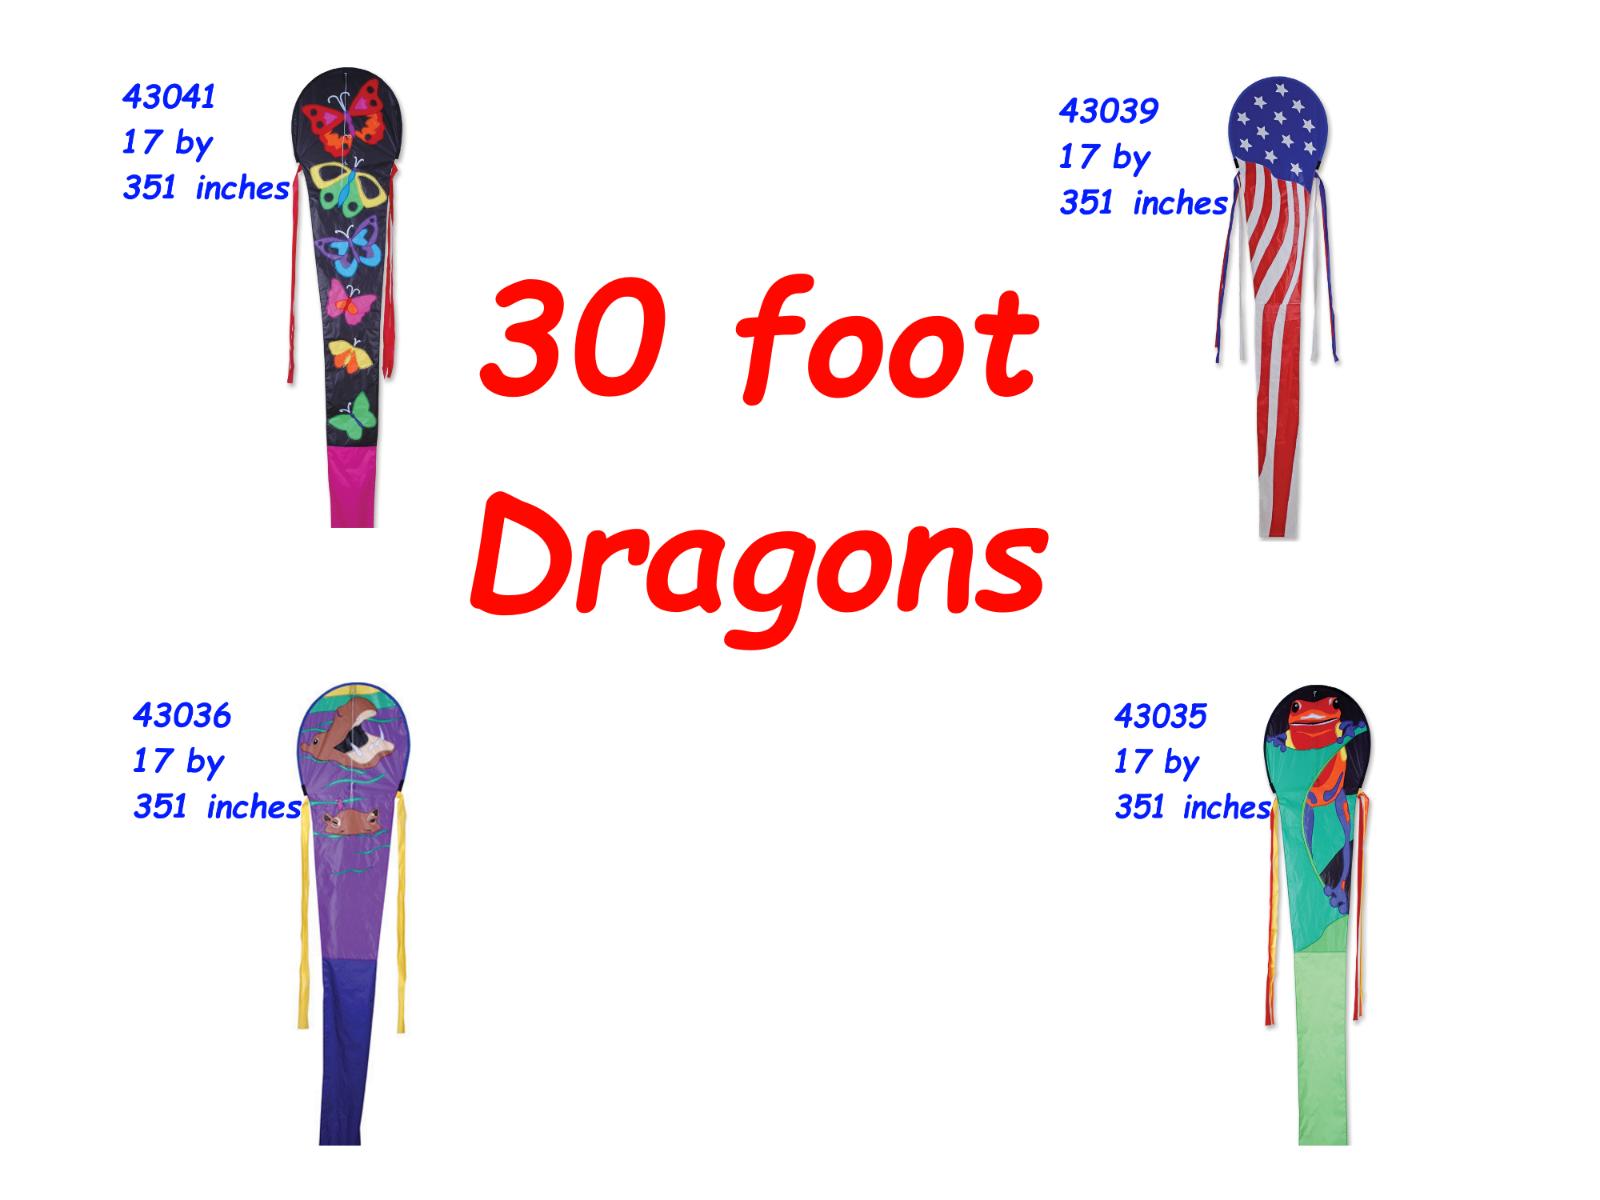 30 foot Dragon Kites by Premier Design